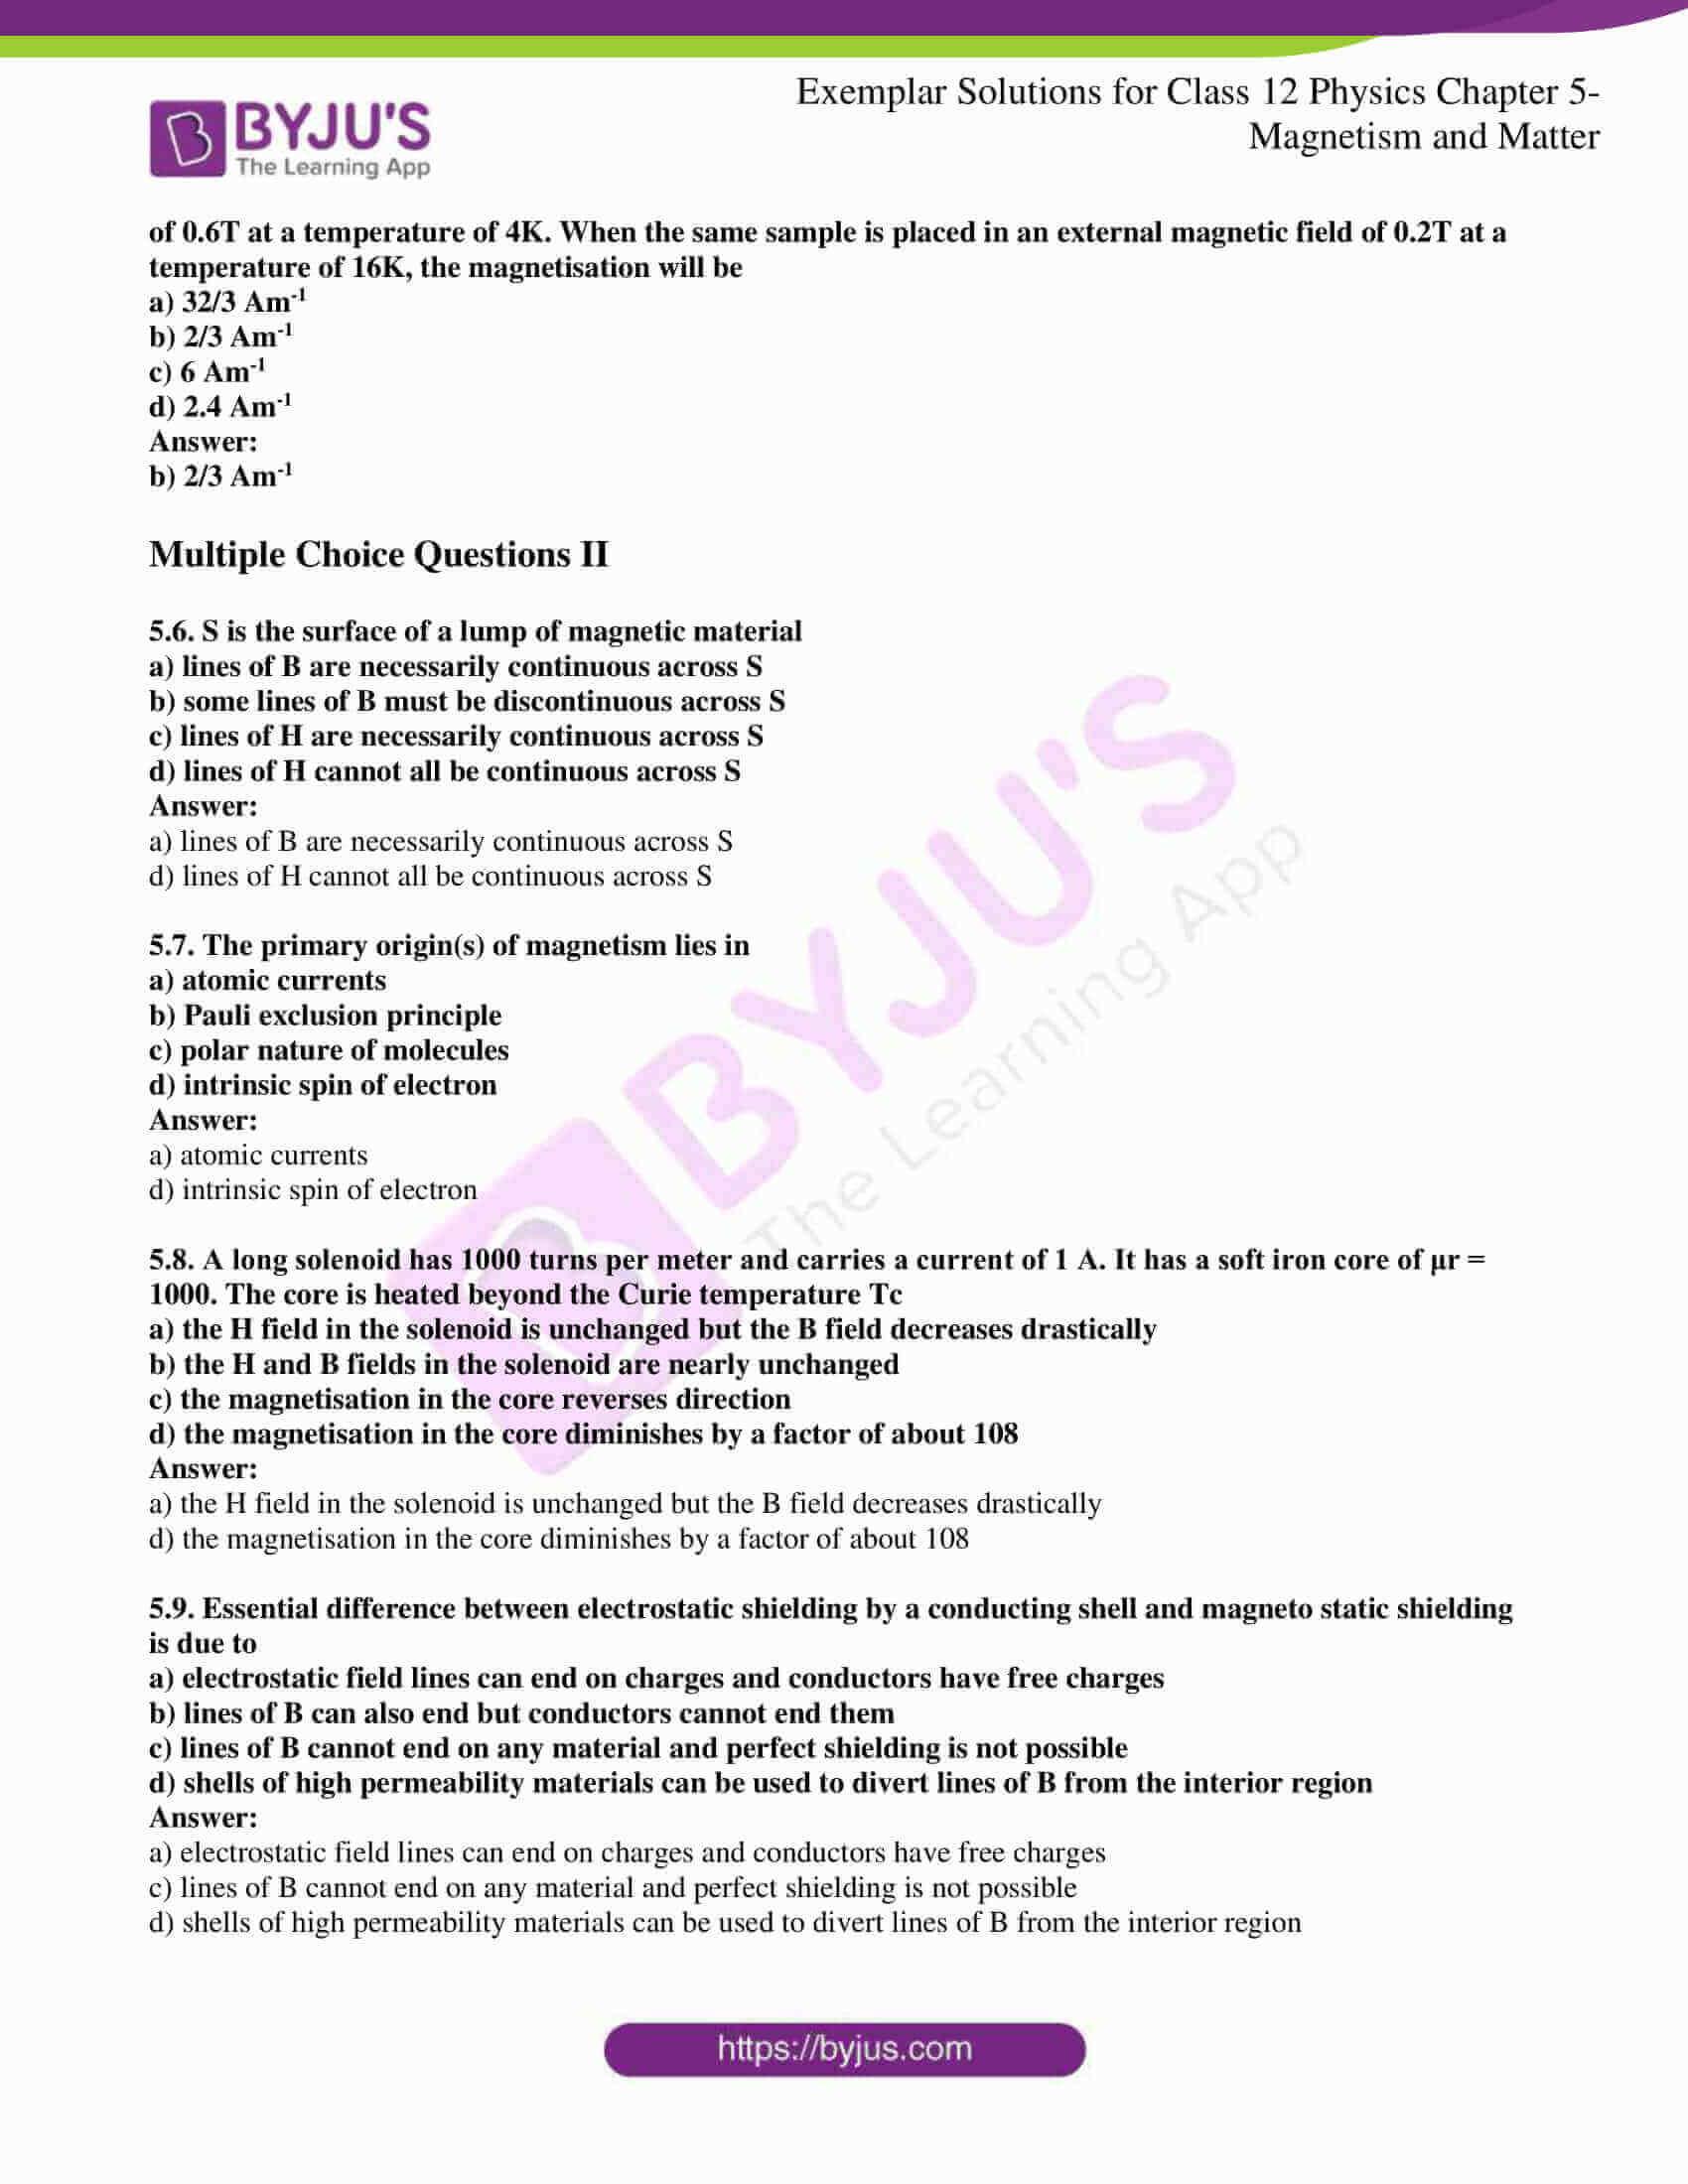 ncert exemplar solutions for class 12 physics chapter 5 02